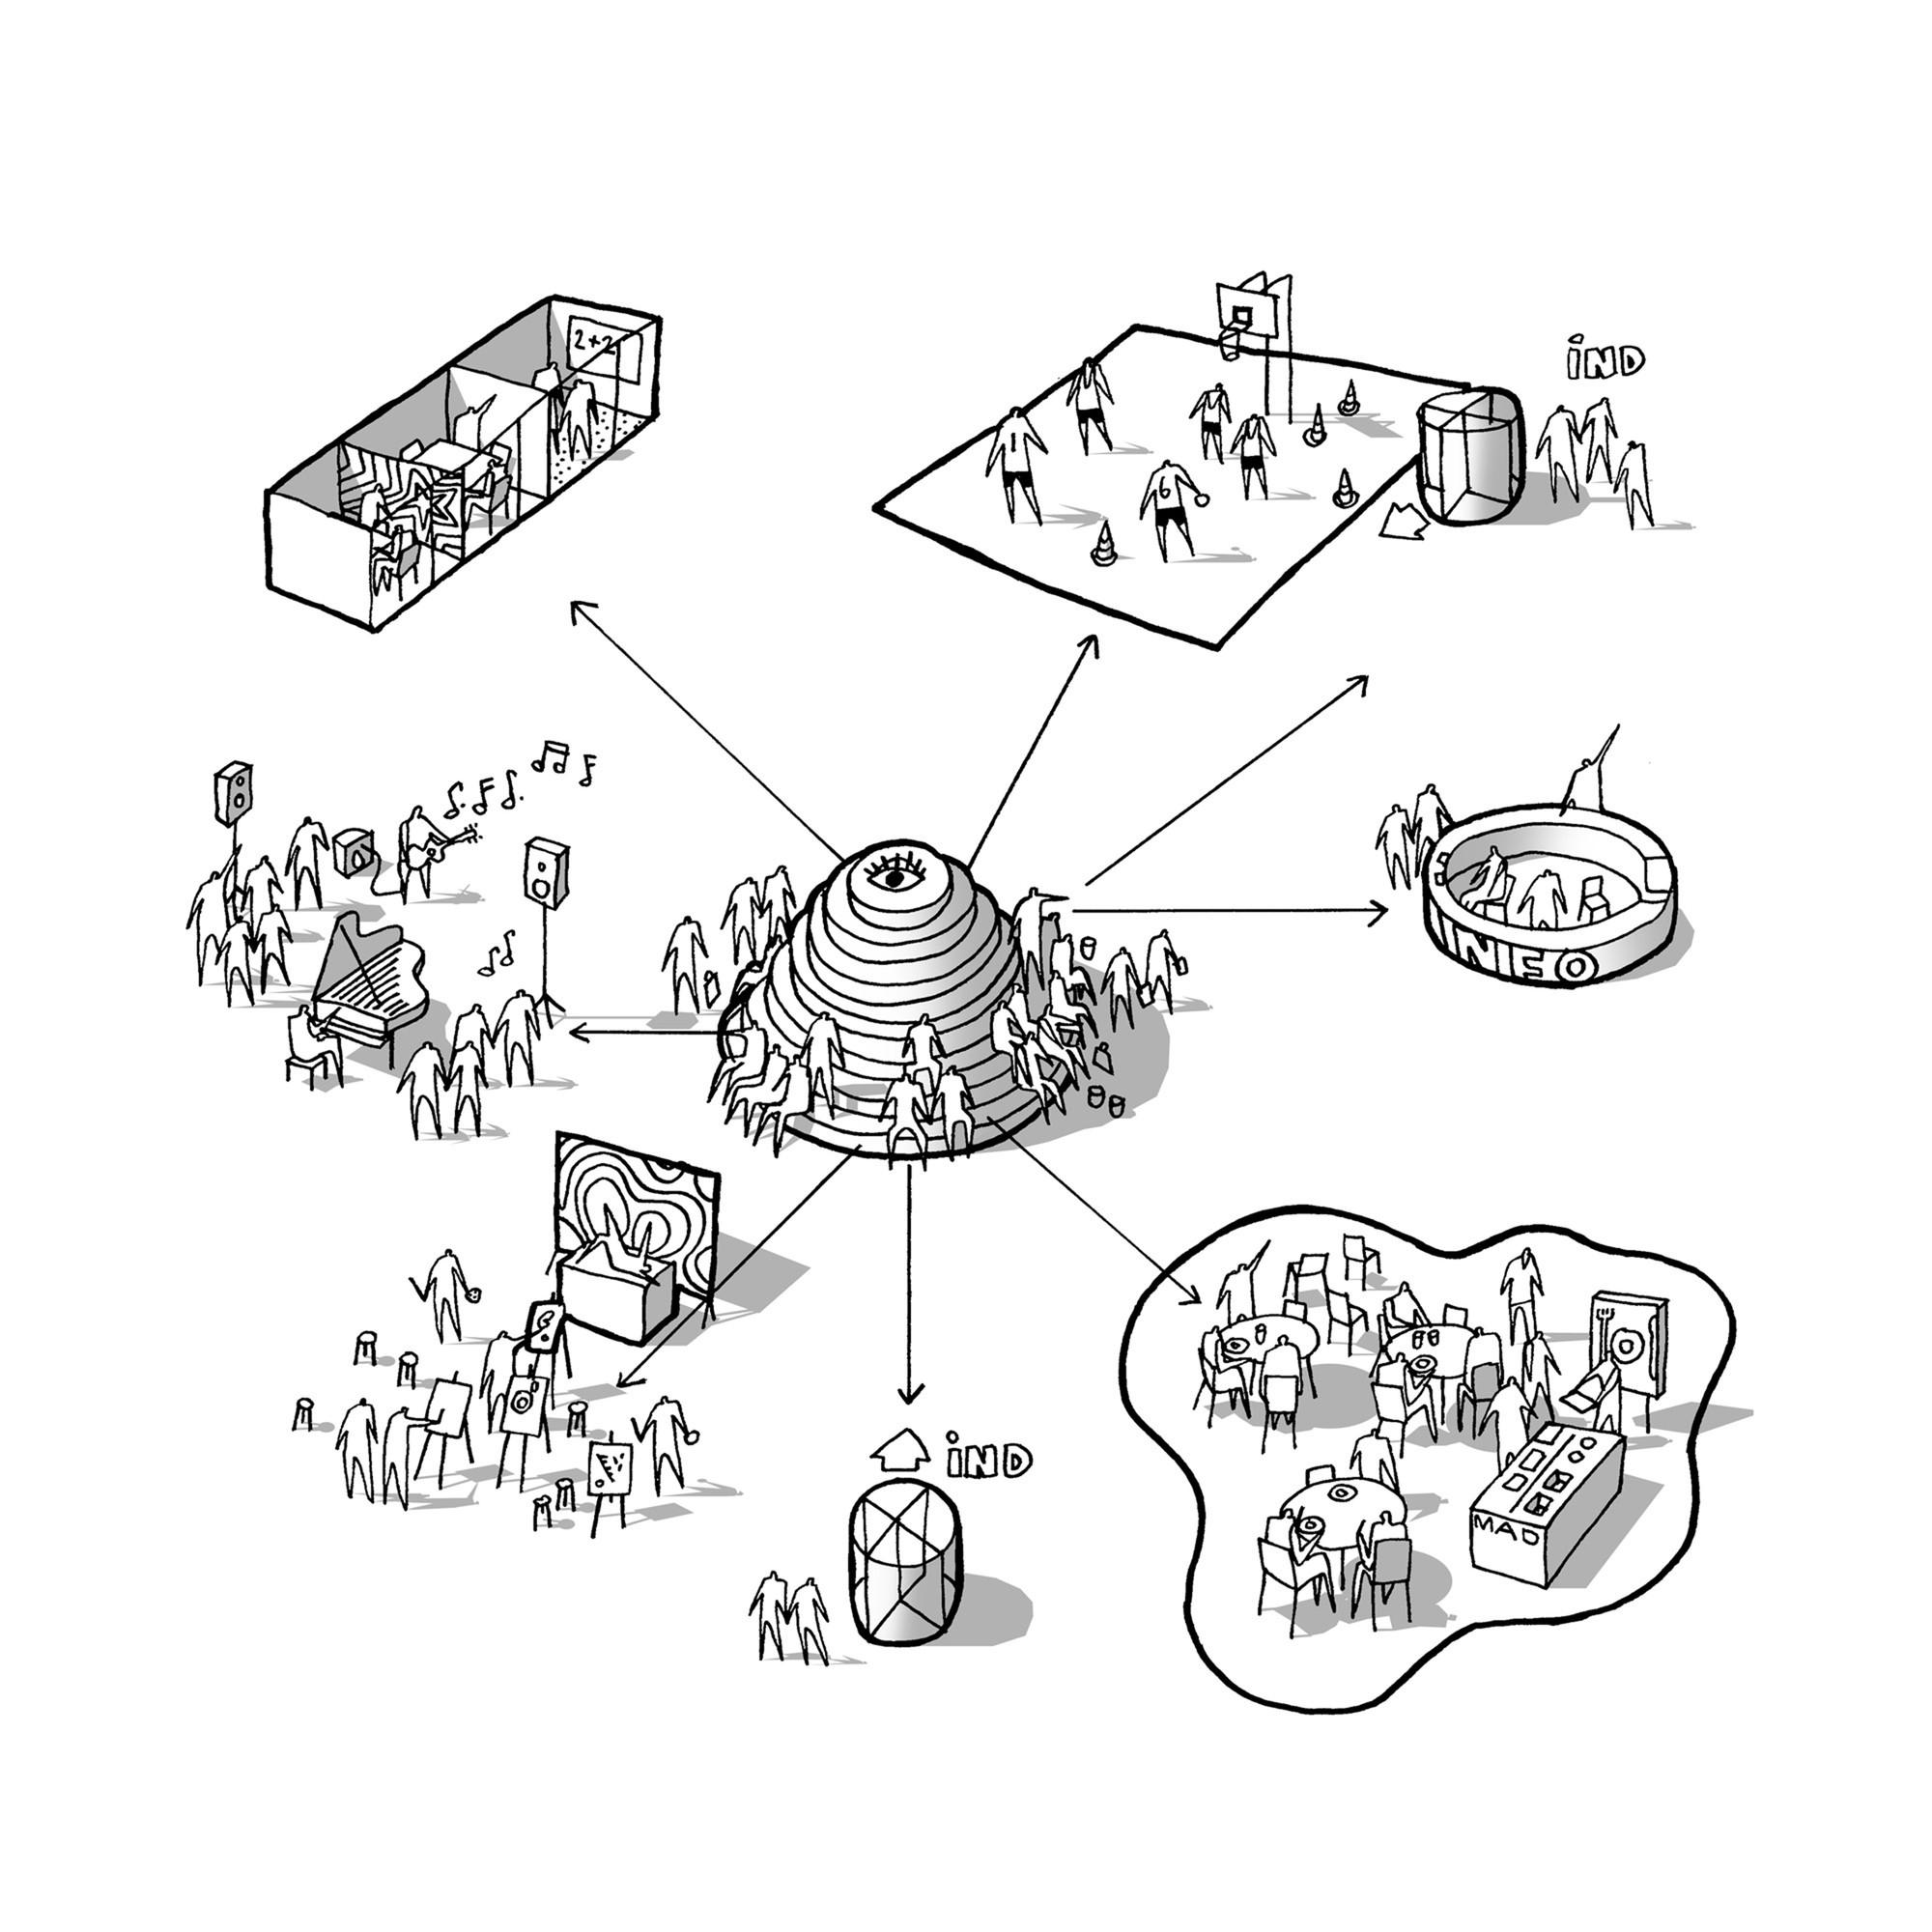 frost diagram bromine galeria de centro educacional hf & vuc fyn / cebra - 17 frost diagram organic chemistry